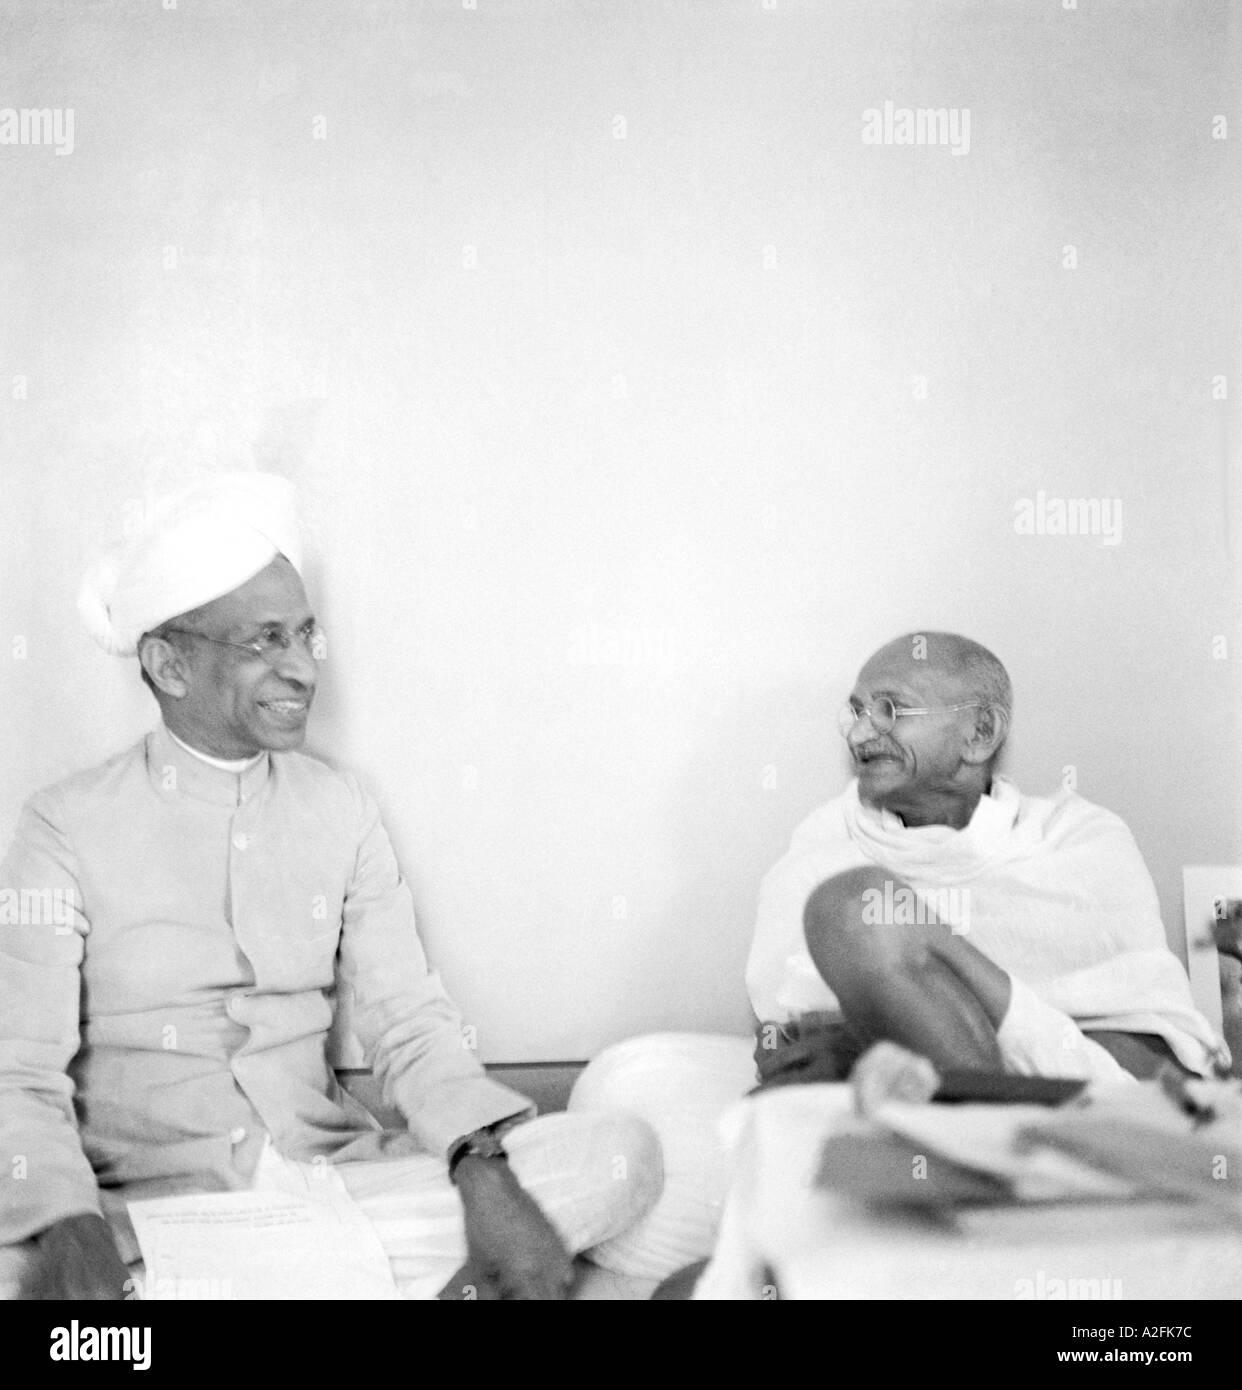 Il Mahatma Gandhi con Sarvepalli Radhakrishnan a Mumbai Bombay Maharashtra India Settembre 1944 Immagini Stock